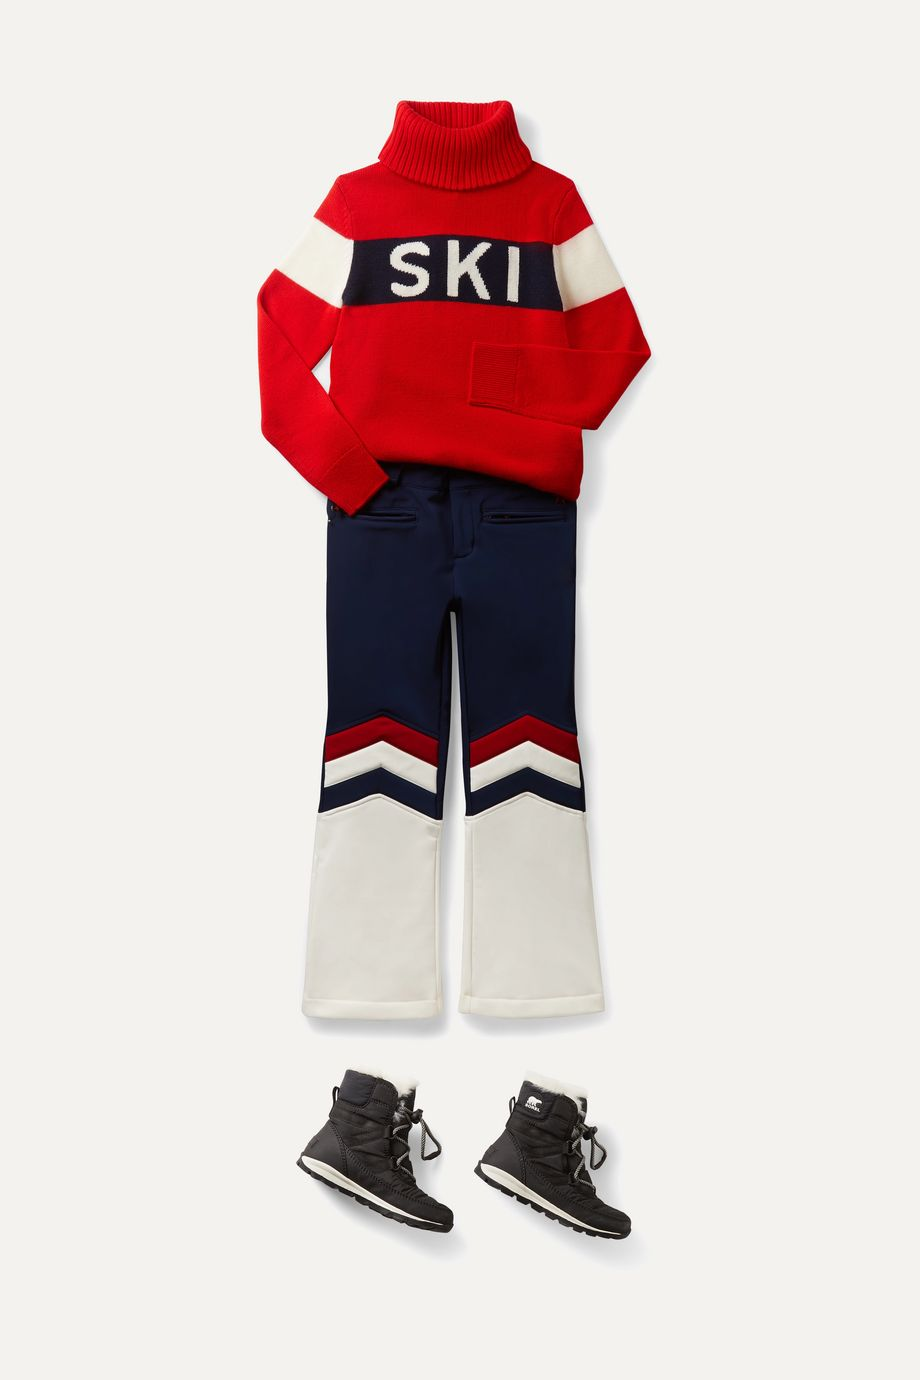 Perfect Moment Kids Ages 6 - 12 Aurora flared ski pants